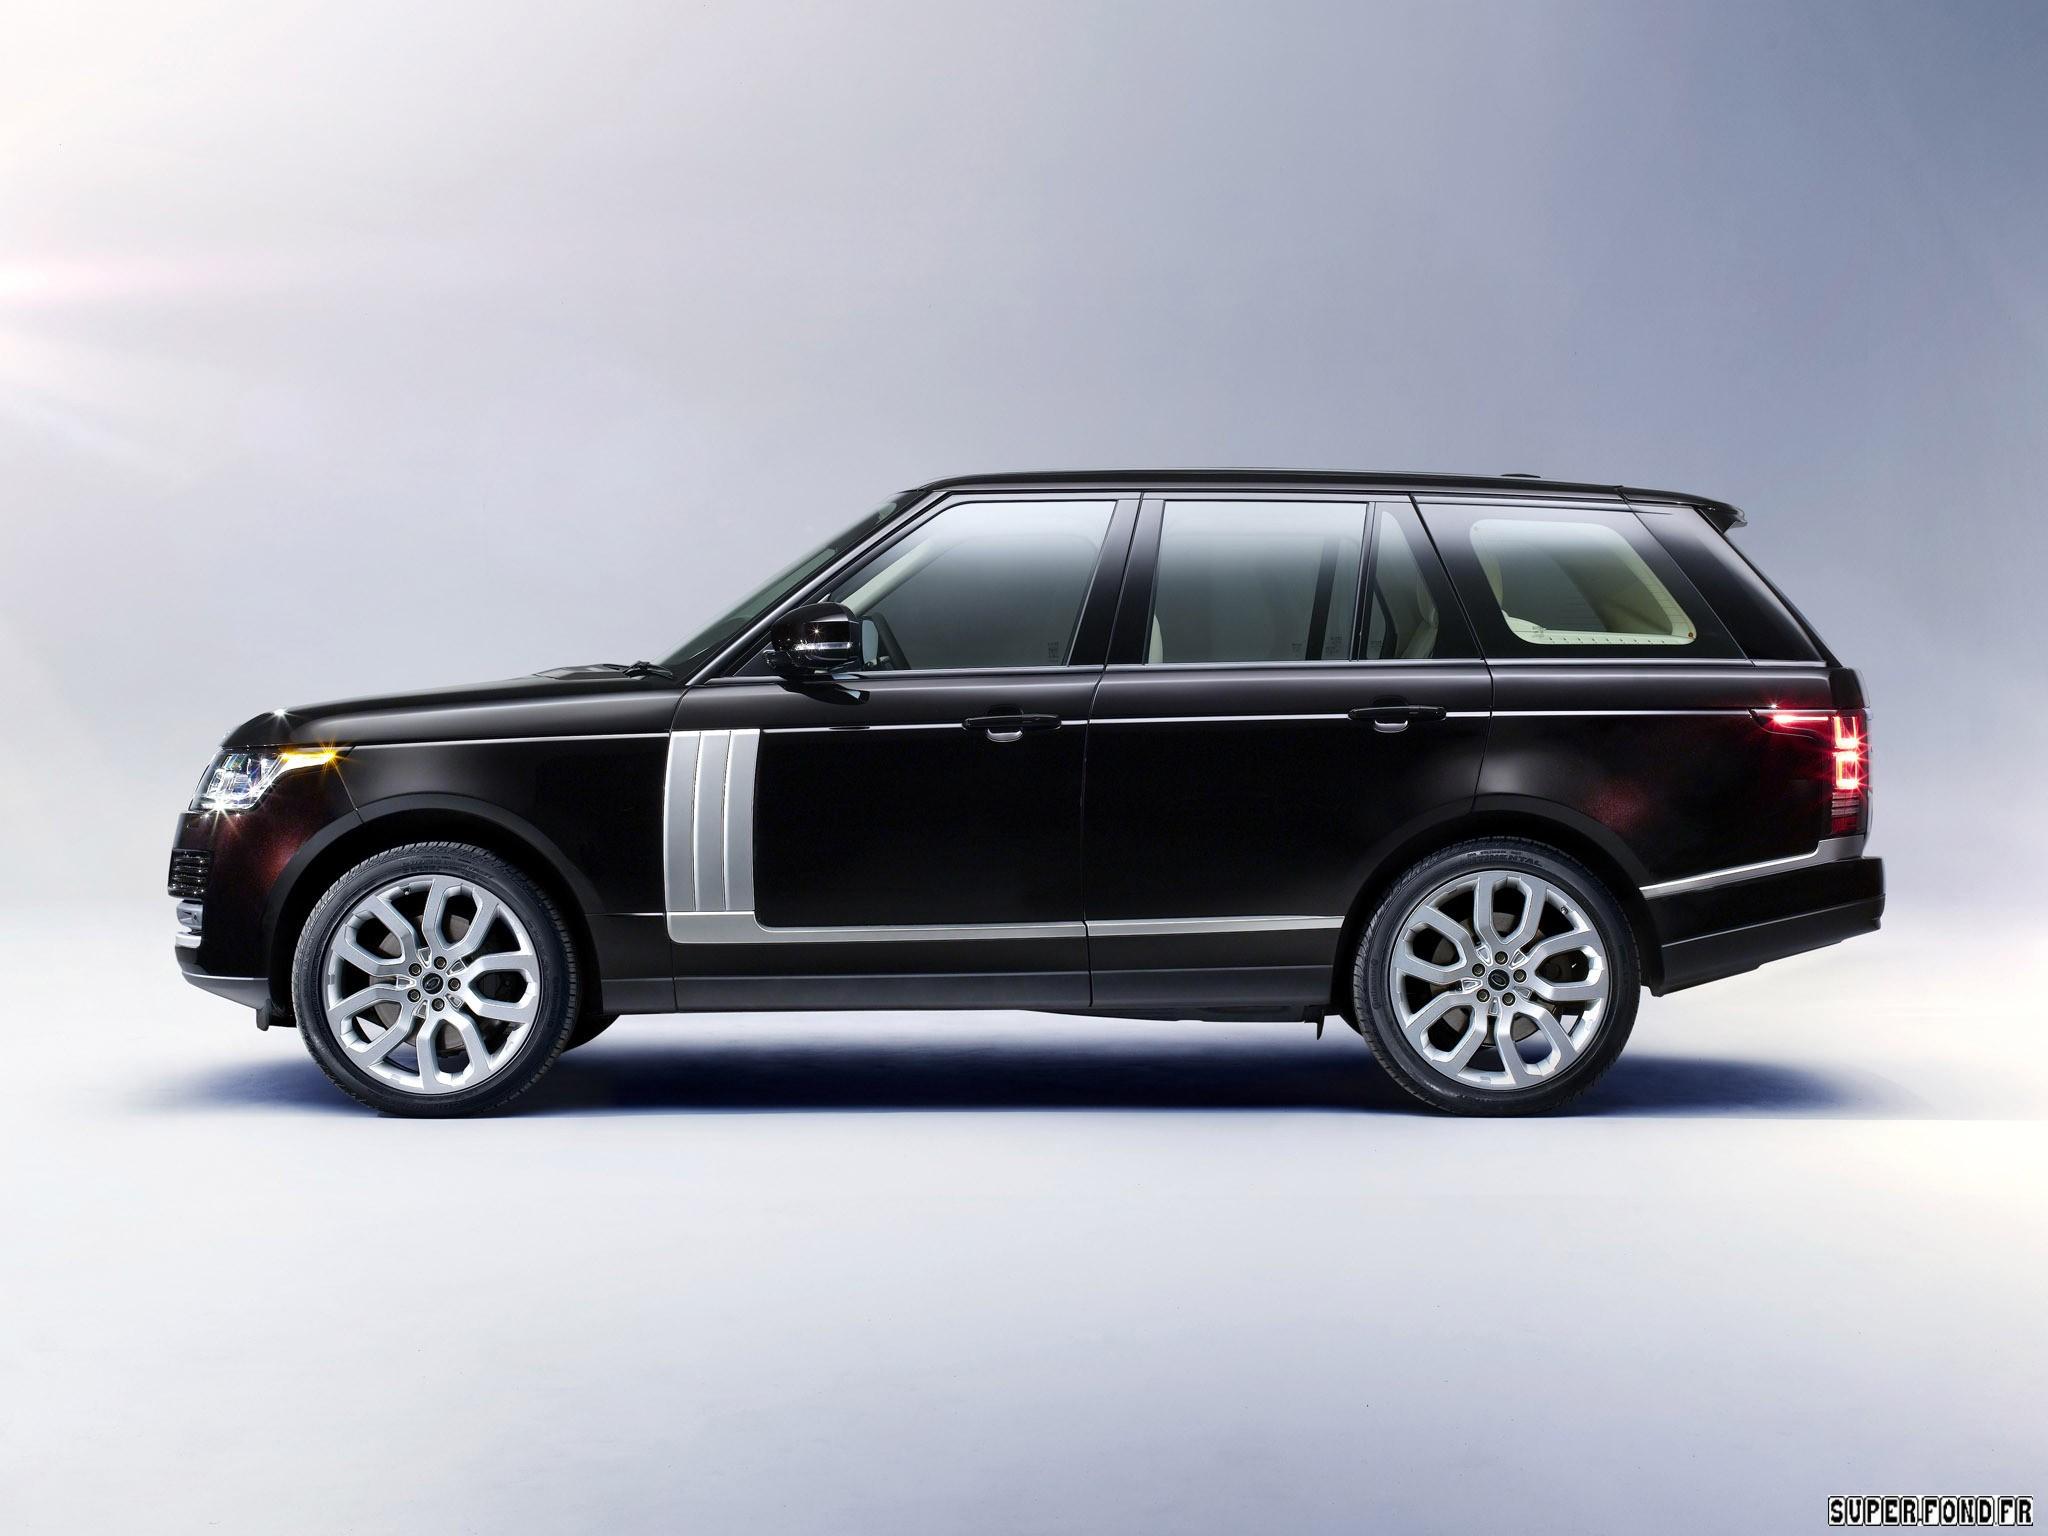 2013 Land Rover Range Rover Vogue UK